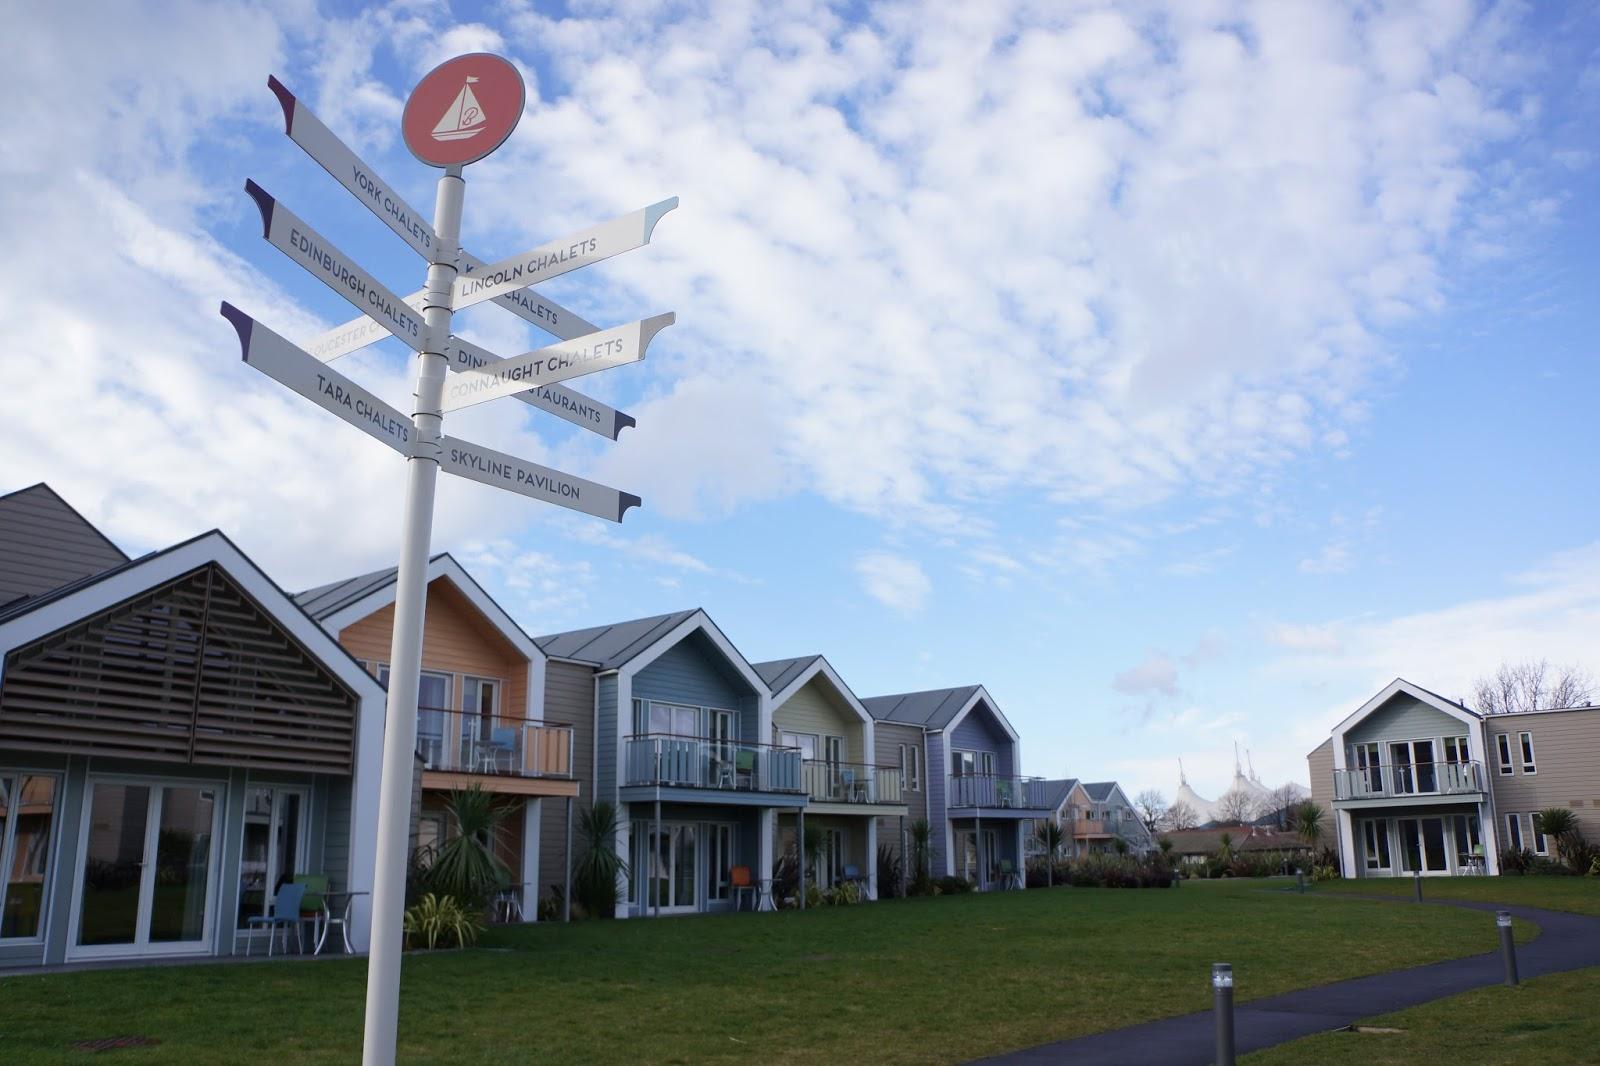 butlins minehead west lakes village signs